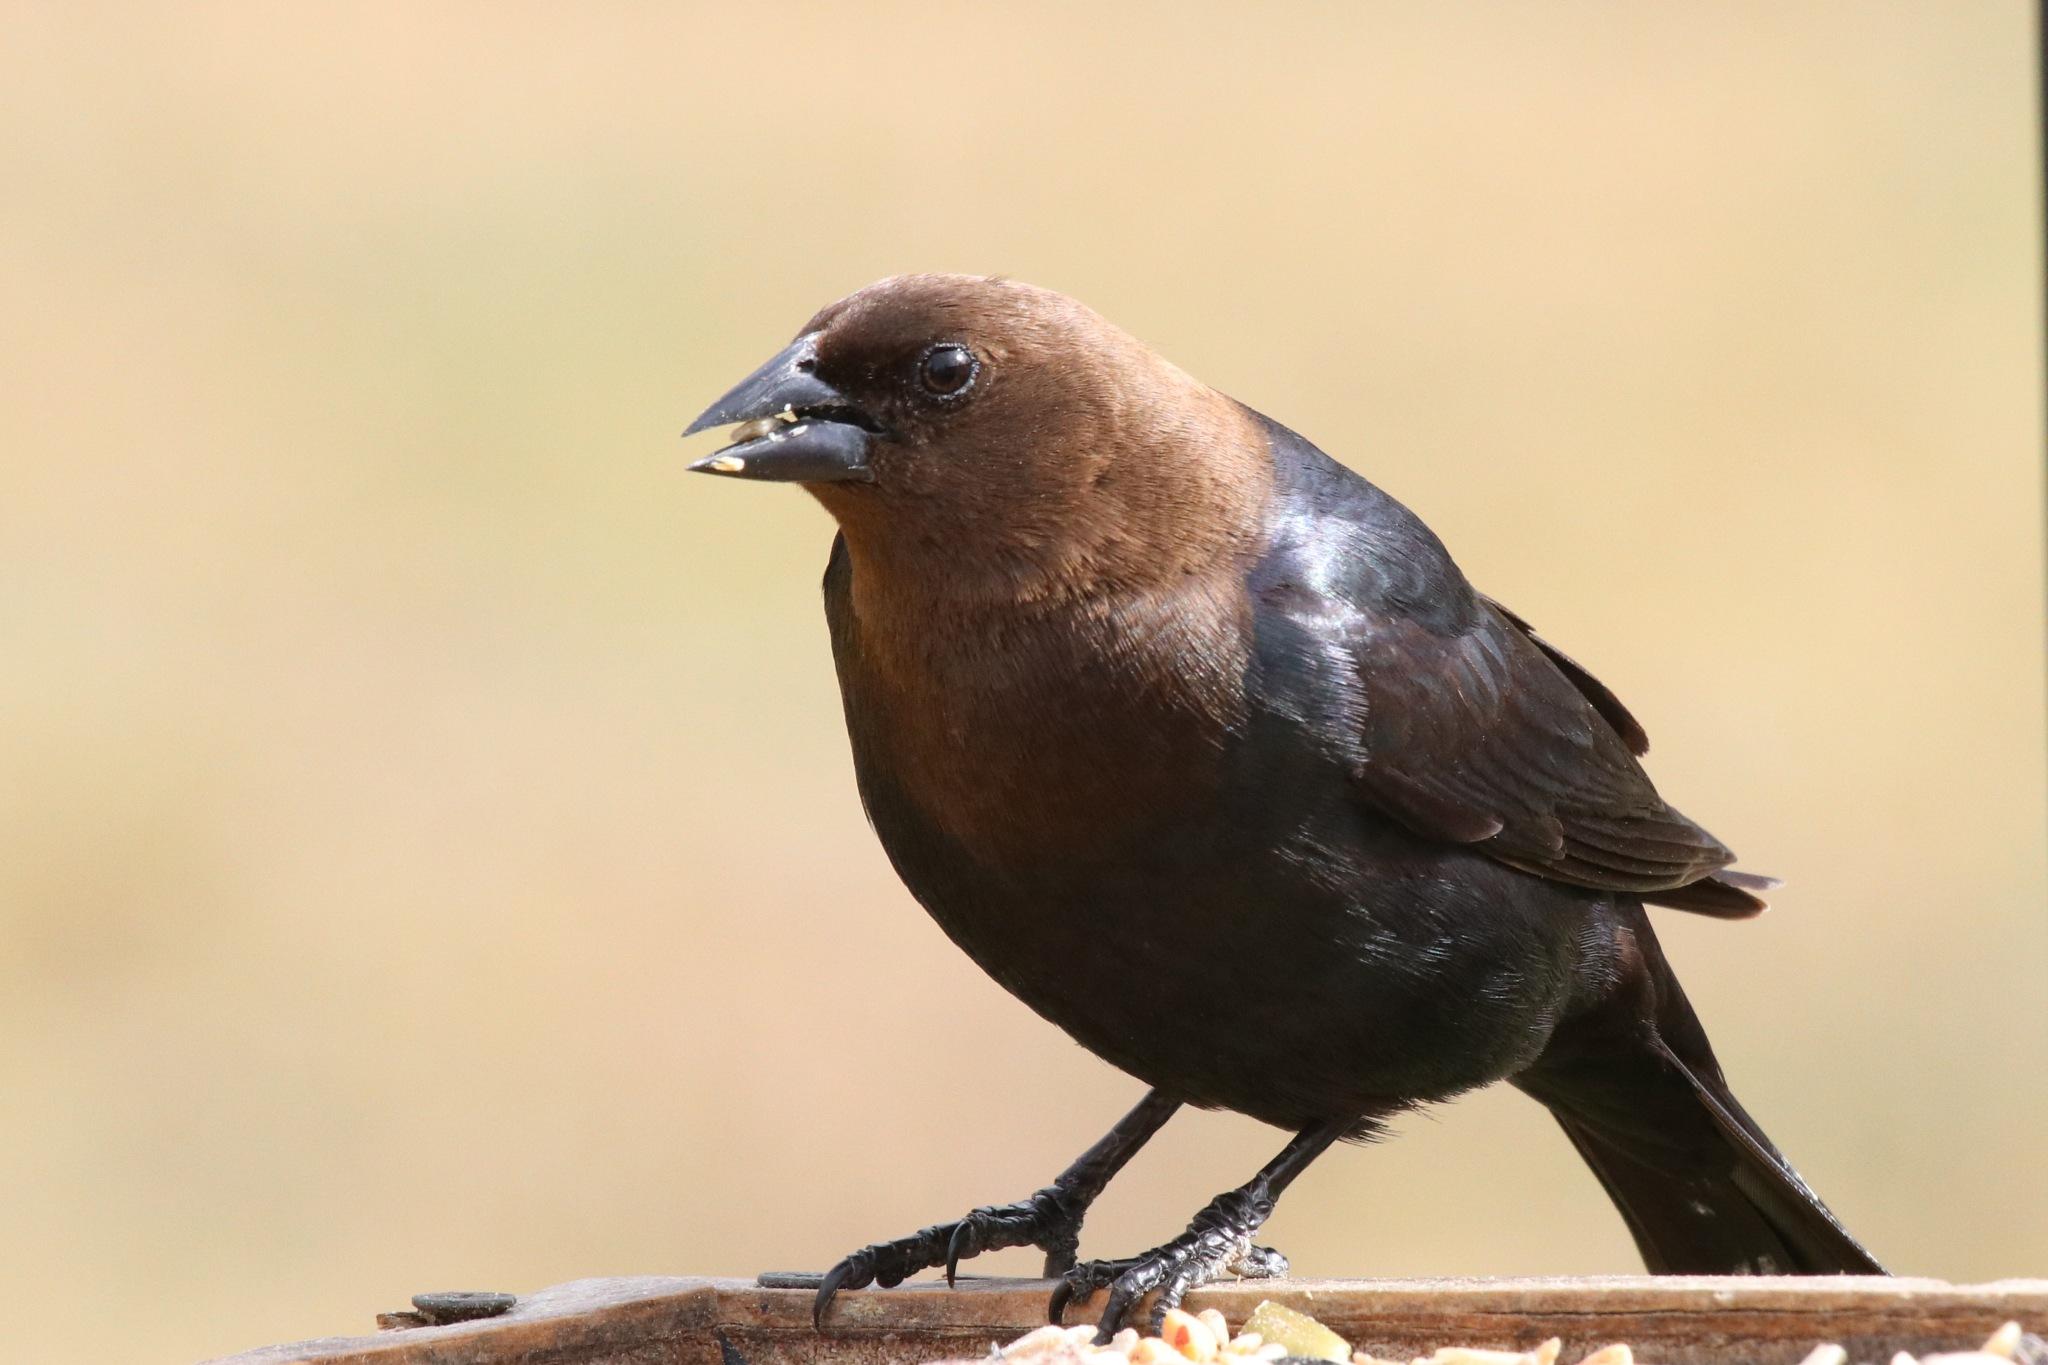 Male Brown-Headed Cowbird by Gregory Kehle